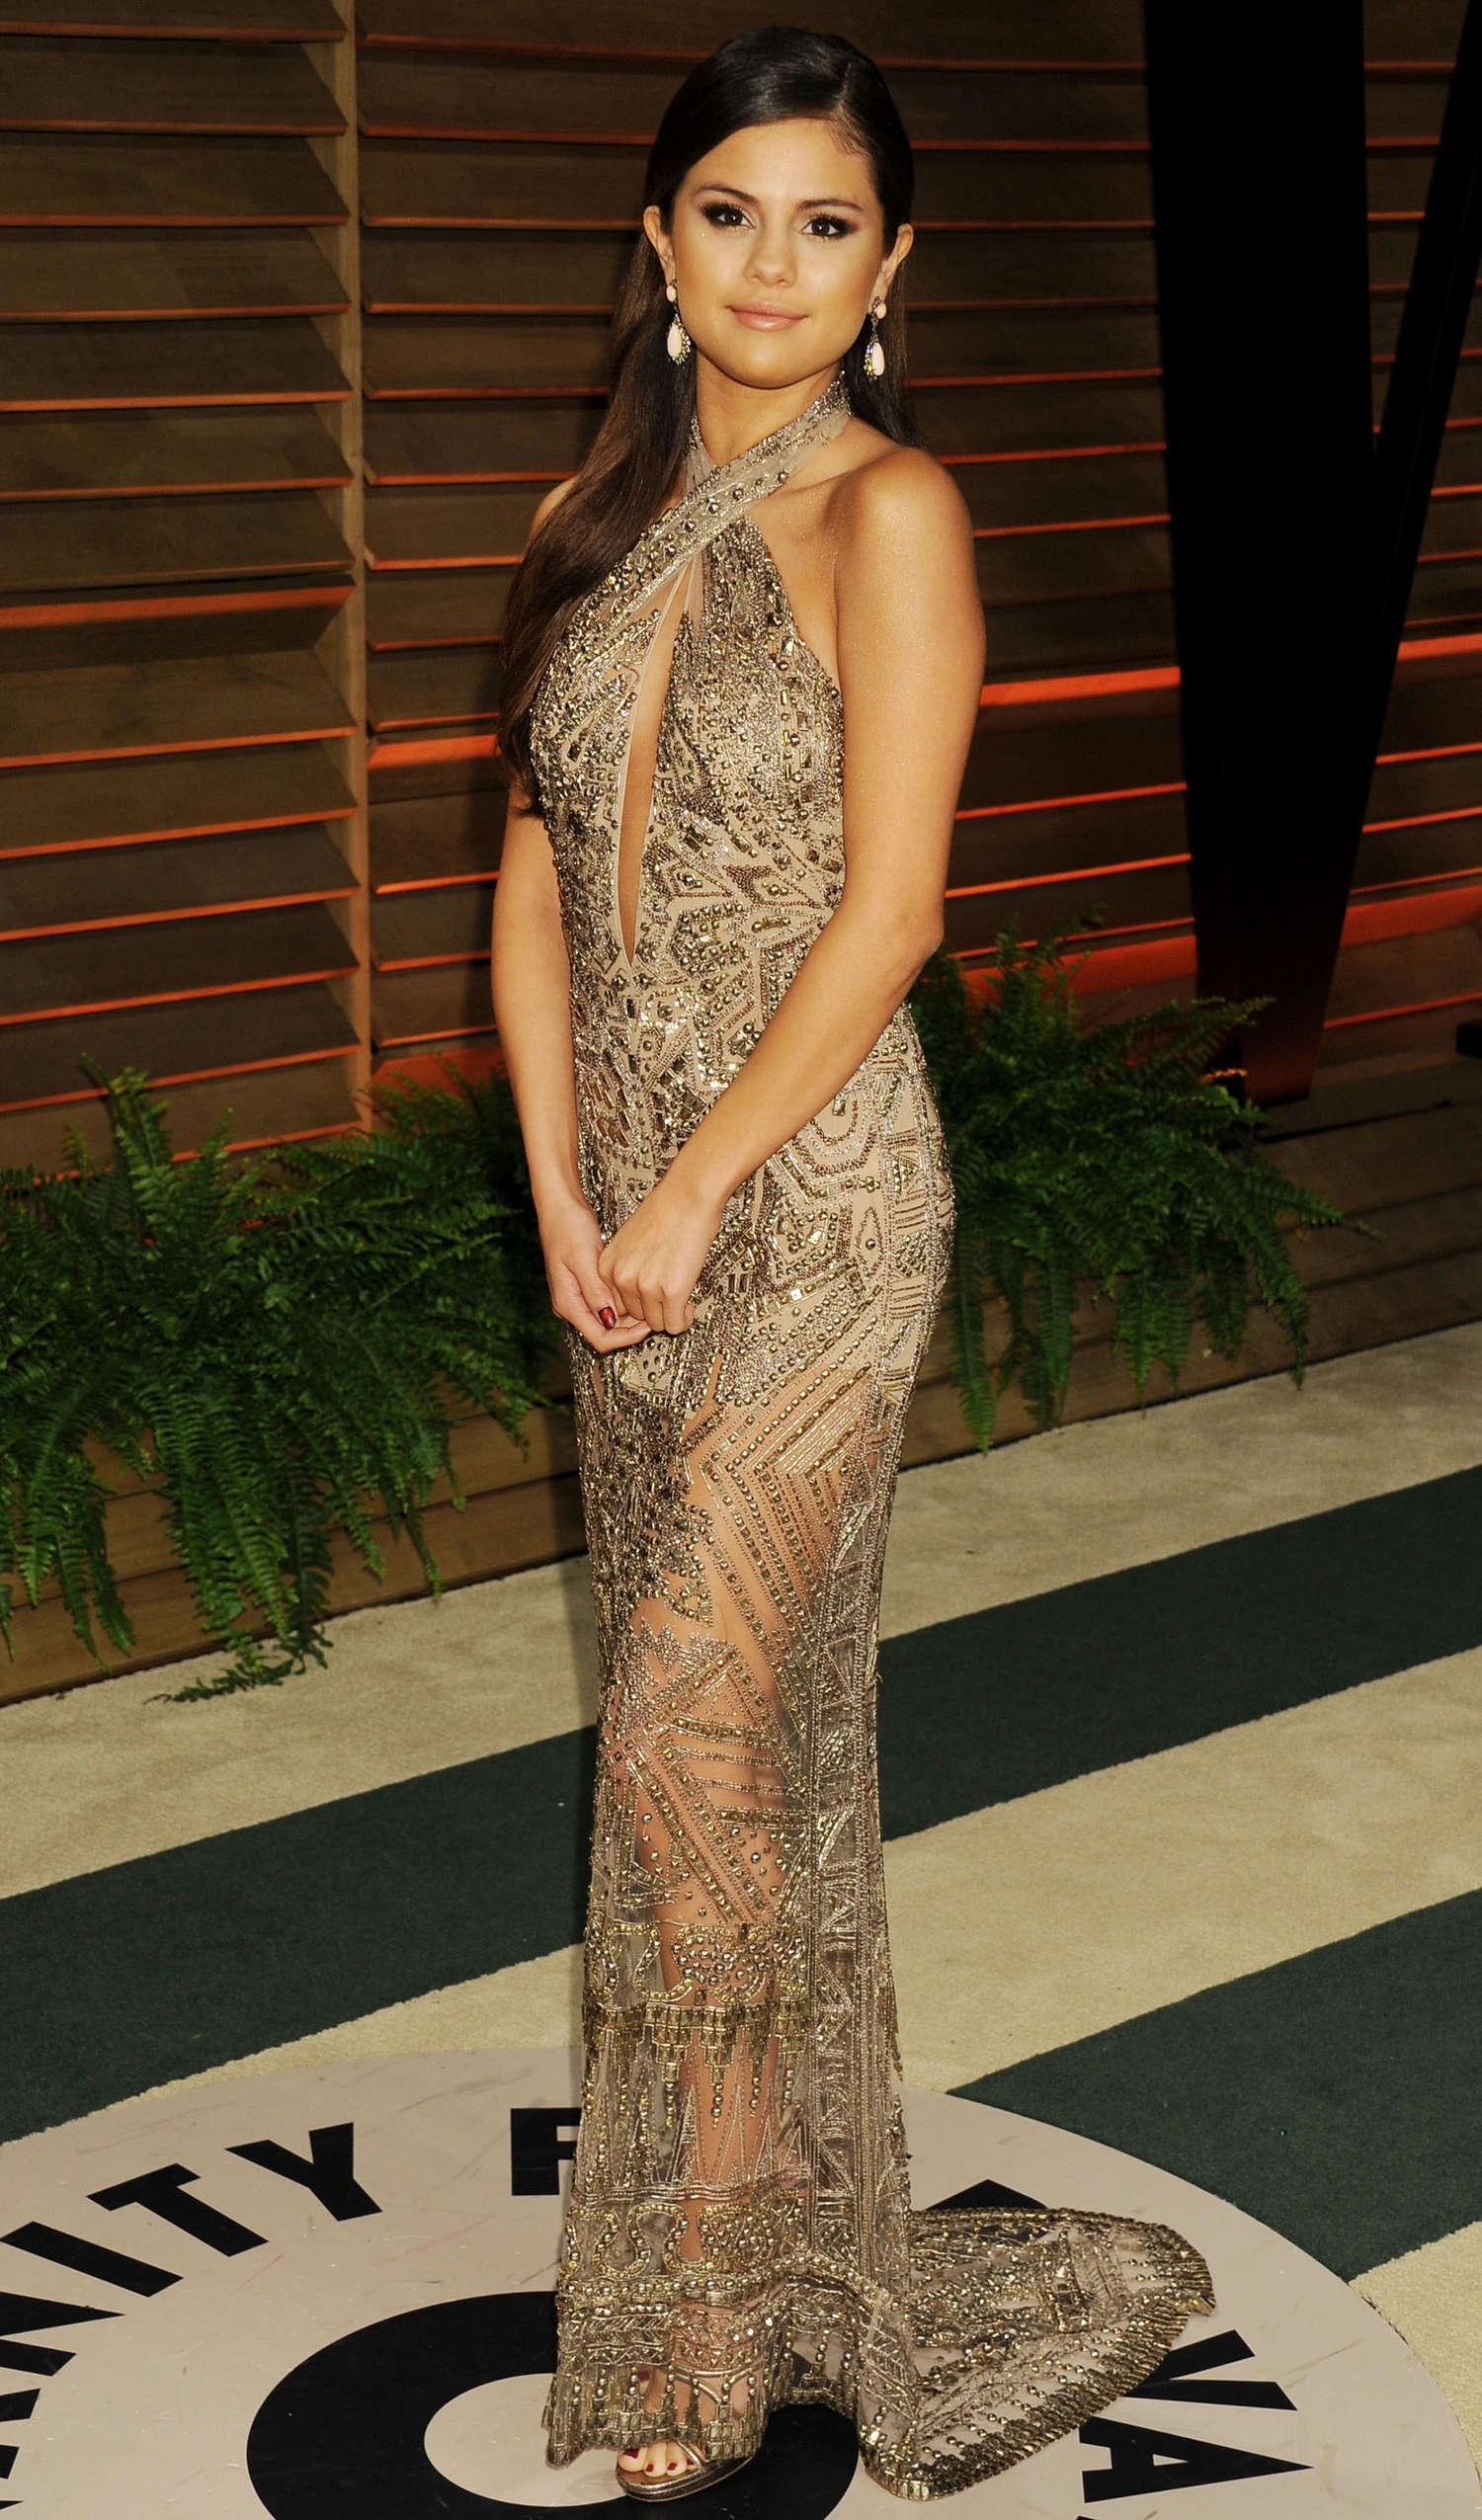 Selena gomez oscar 2014 vanity fair party 02 gotceleb - Photo selena gomez 2014 ...